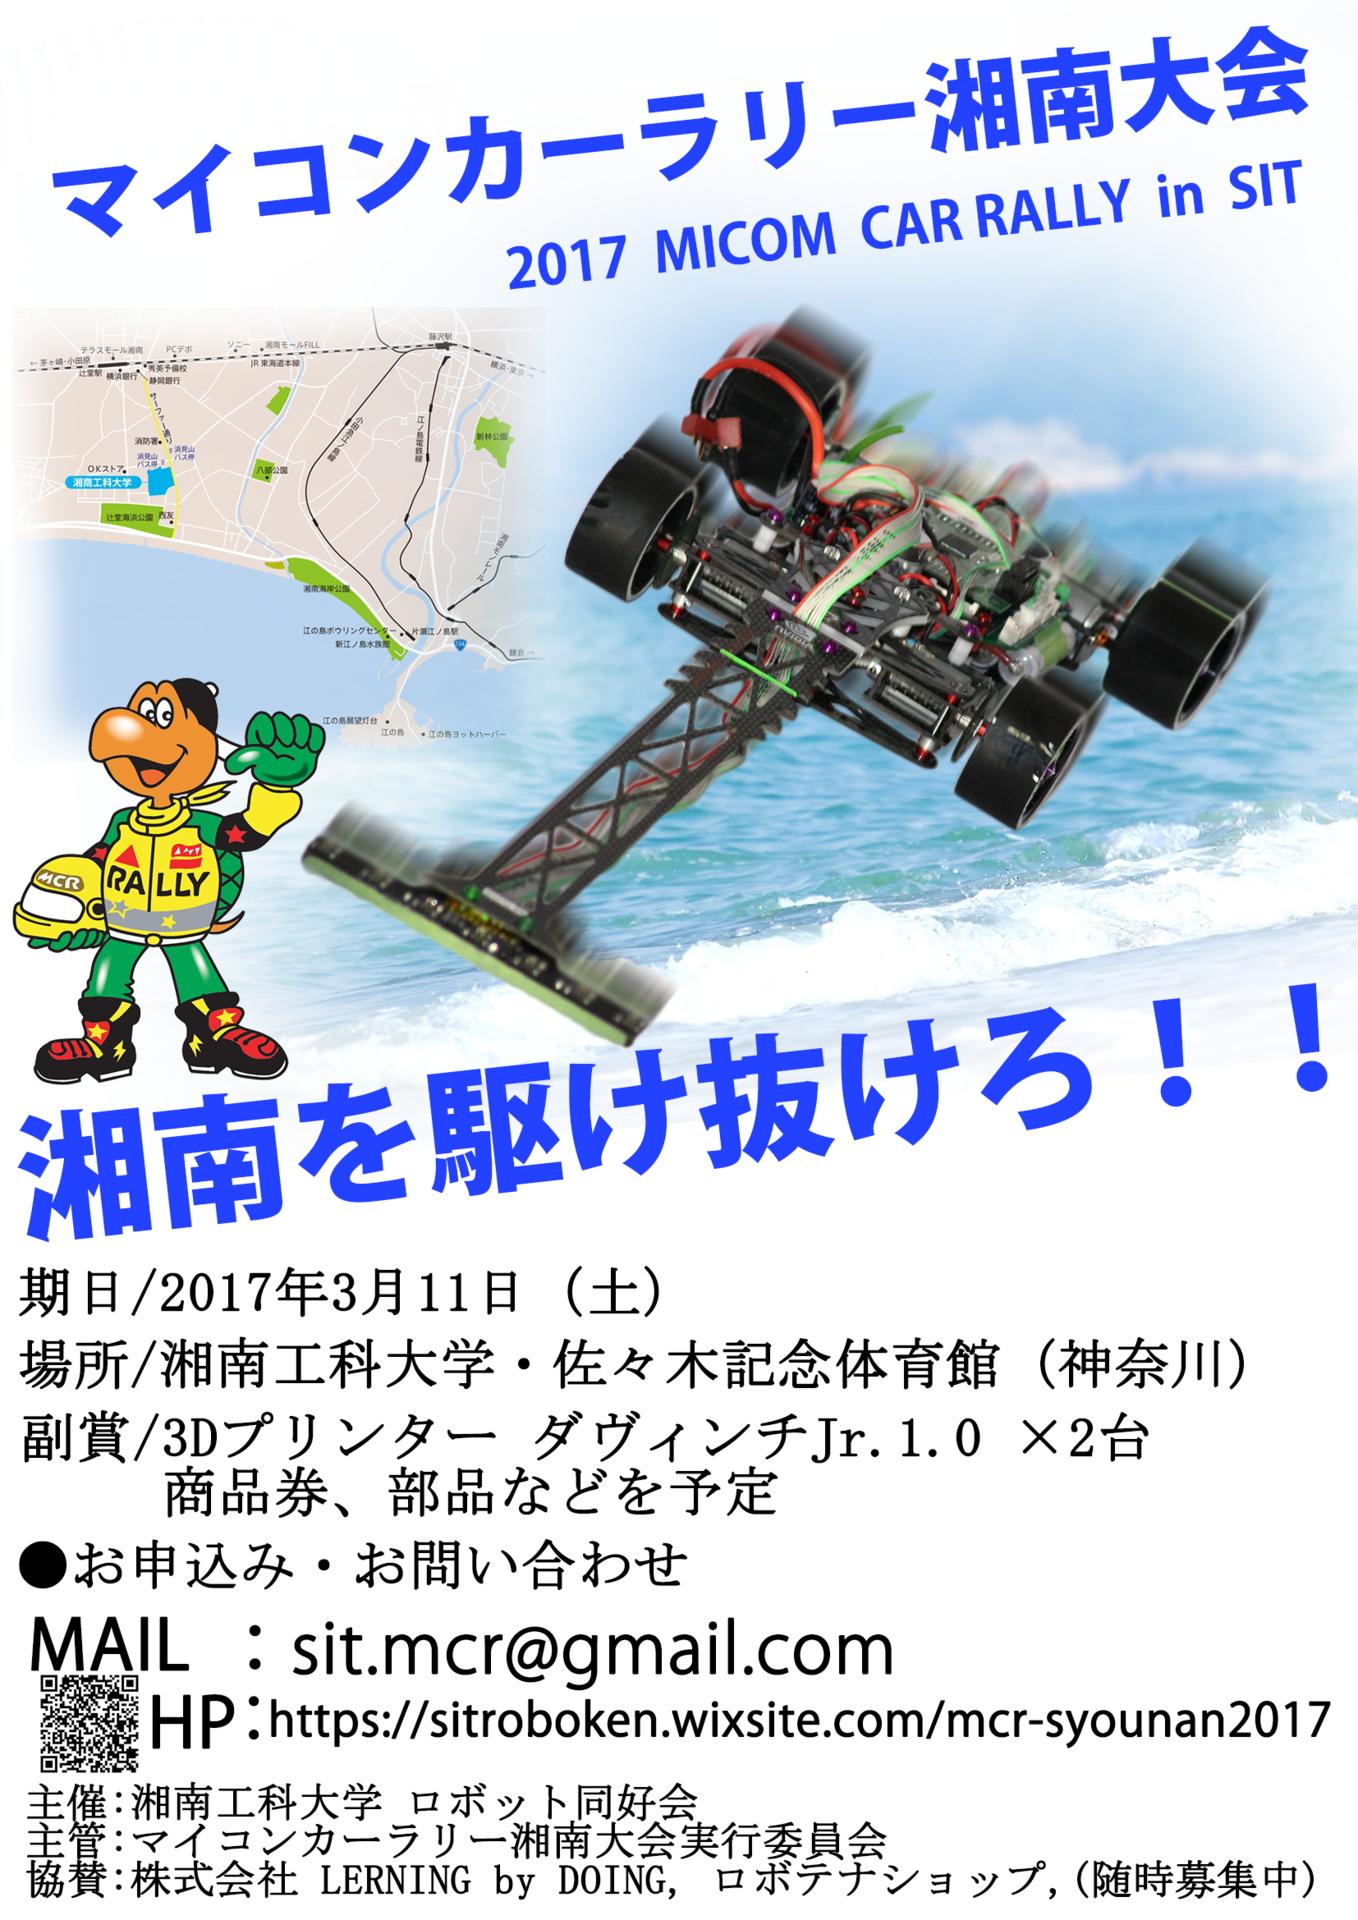 f:id:mrsaitouyusuke:20170129024804p:plain